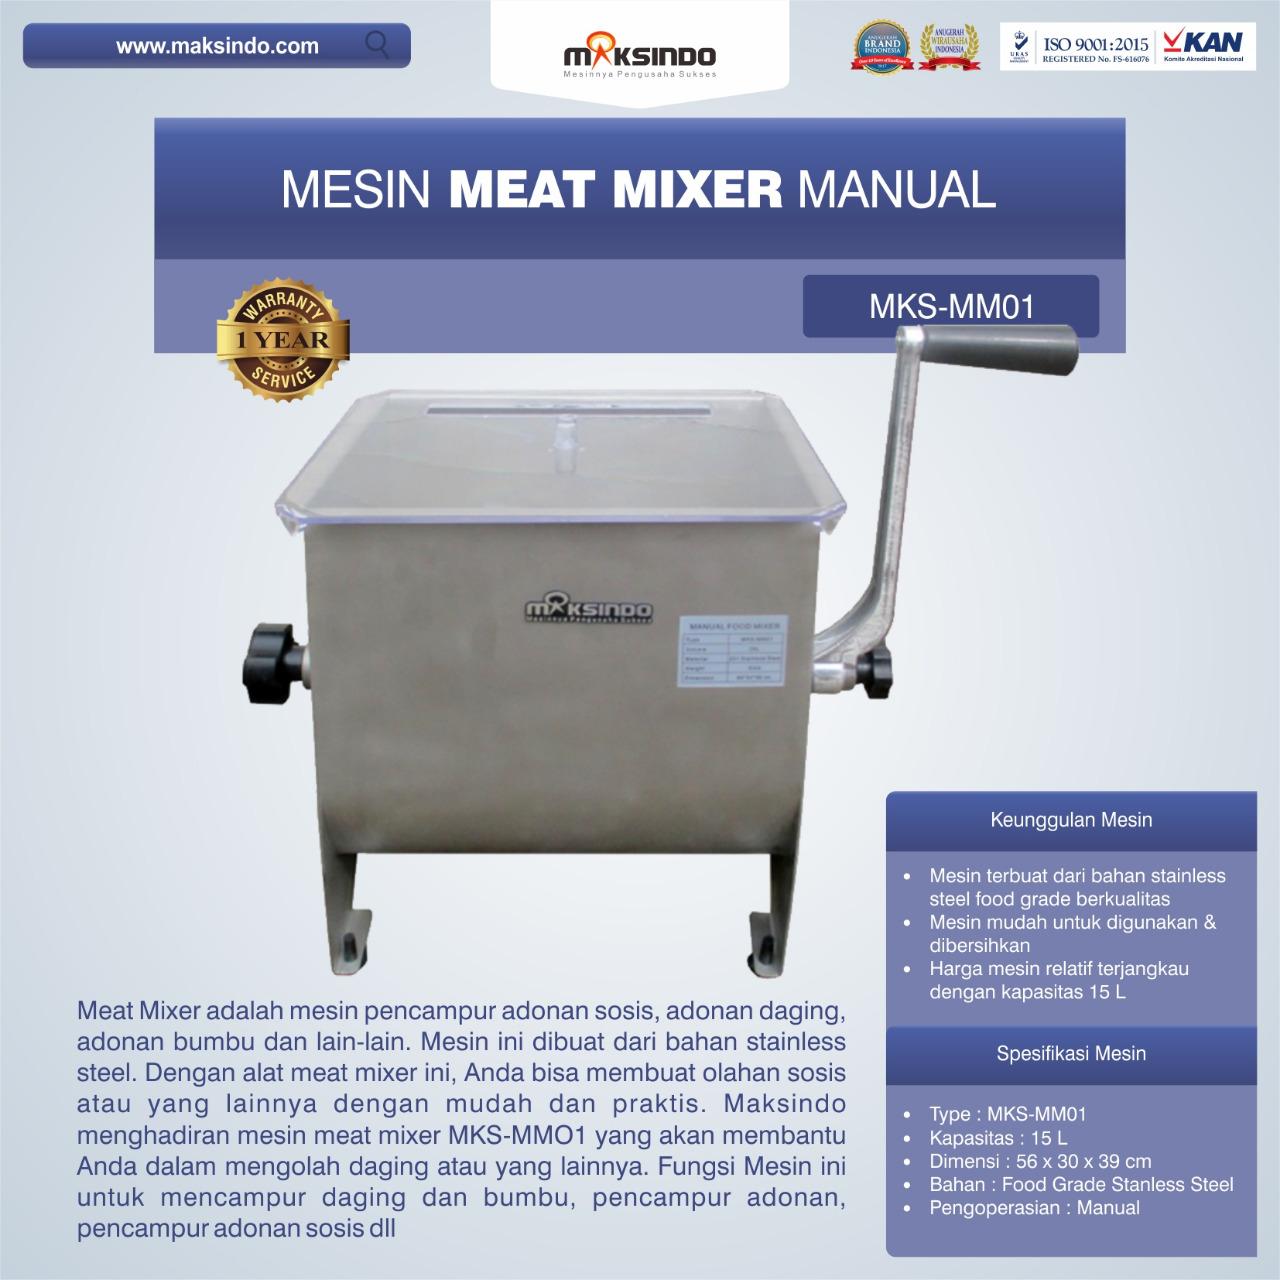 Manual Meat Mixer MKS-MM01